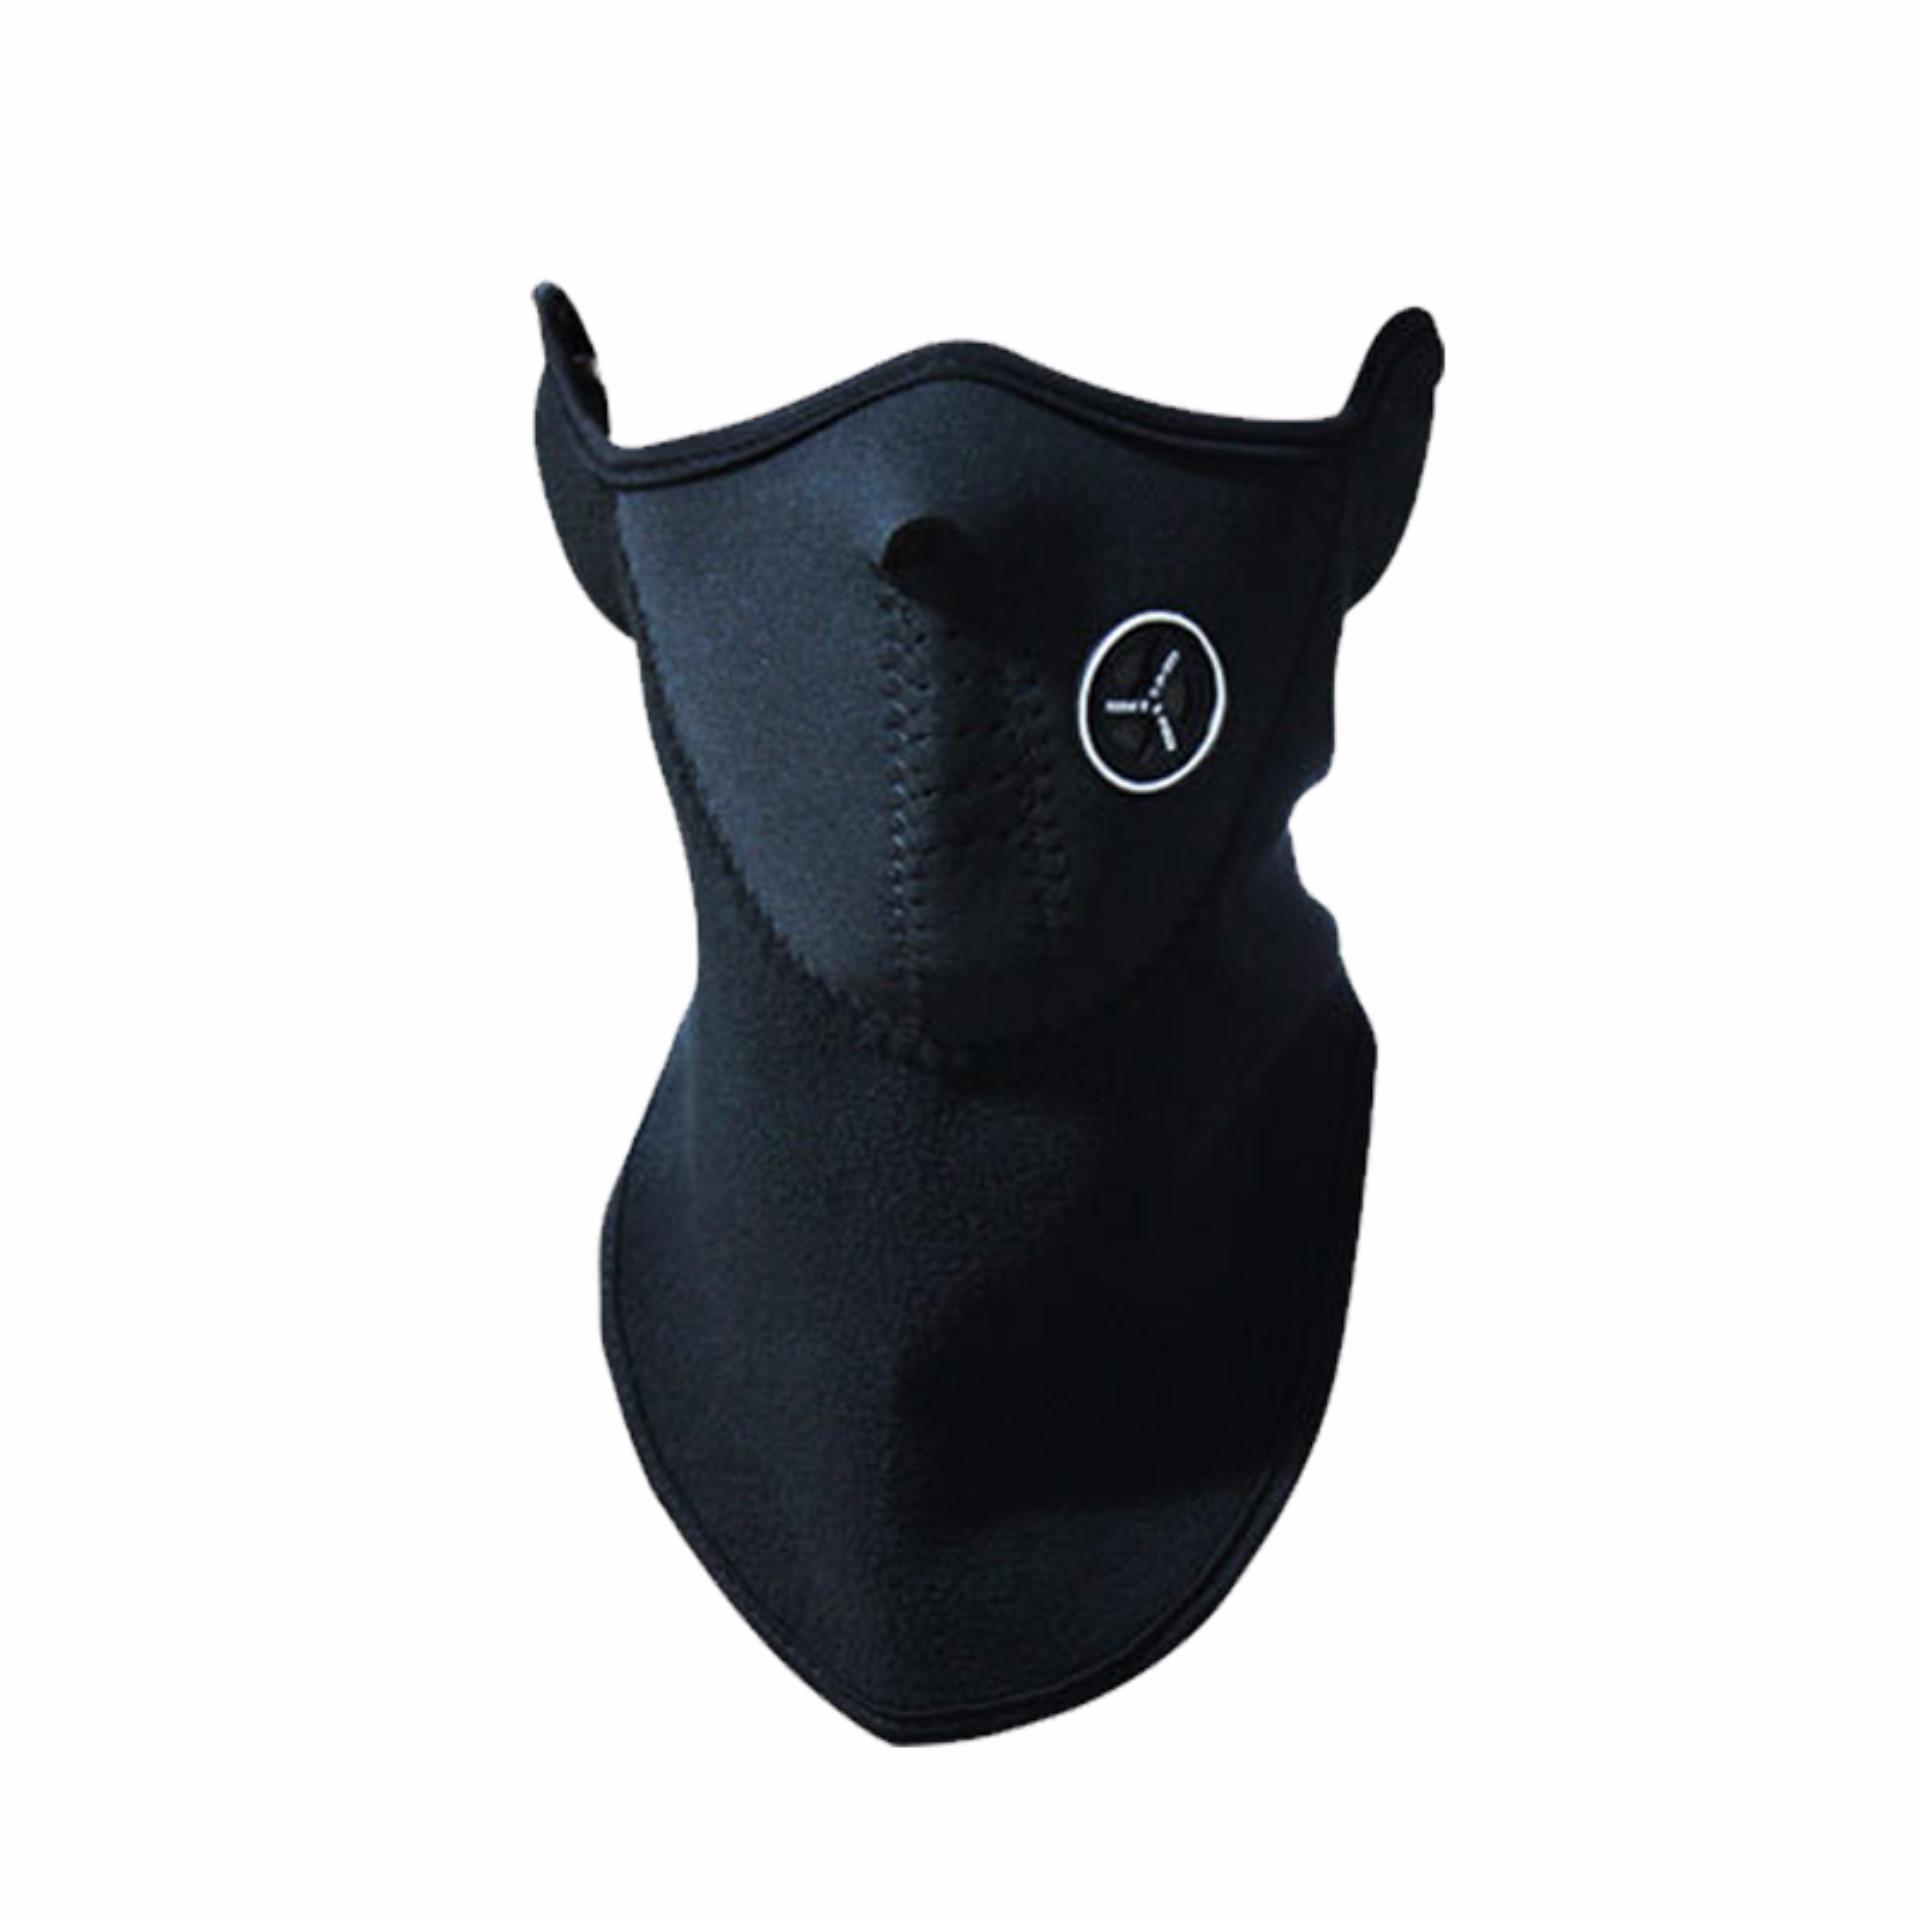 Kalibre 991039 000 Headwear Alas Helm Sepeda Motor Kupluk Hitam Lari 991164 999 Source Eelic 887 Masker